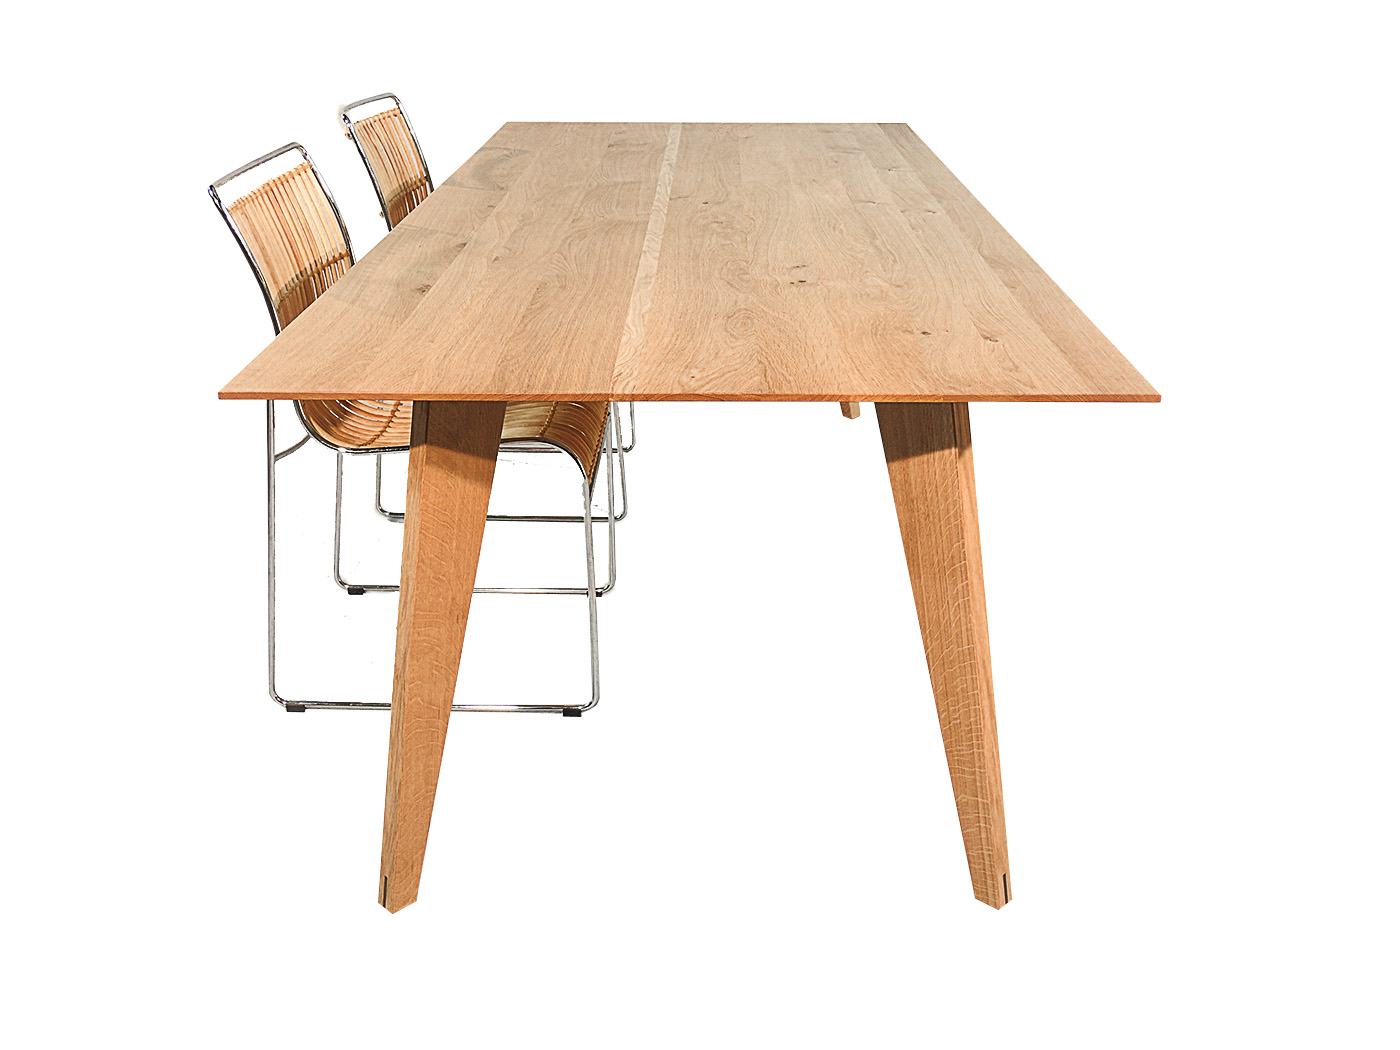 Notenhouten Uitschuifbare Eettafel.Modena Design Eiken Eettafel